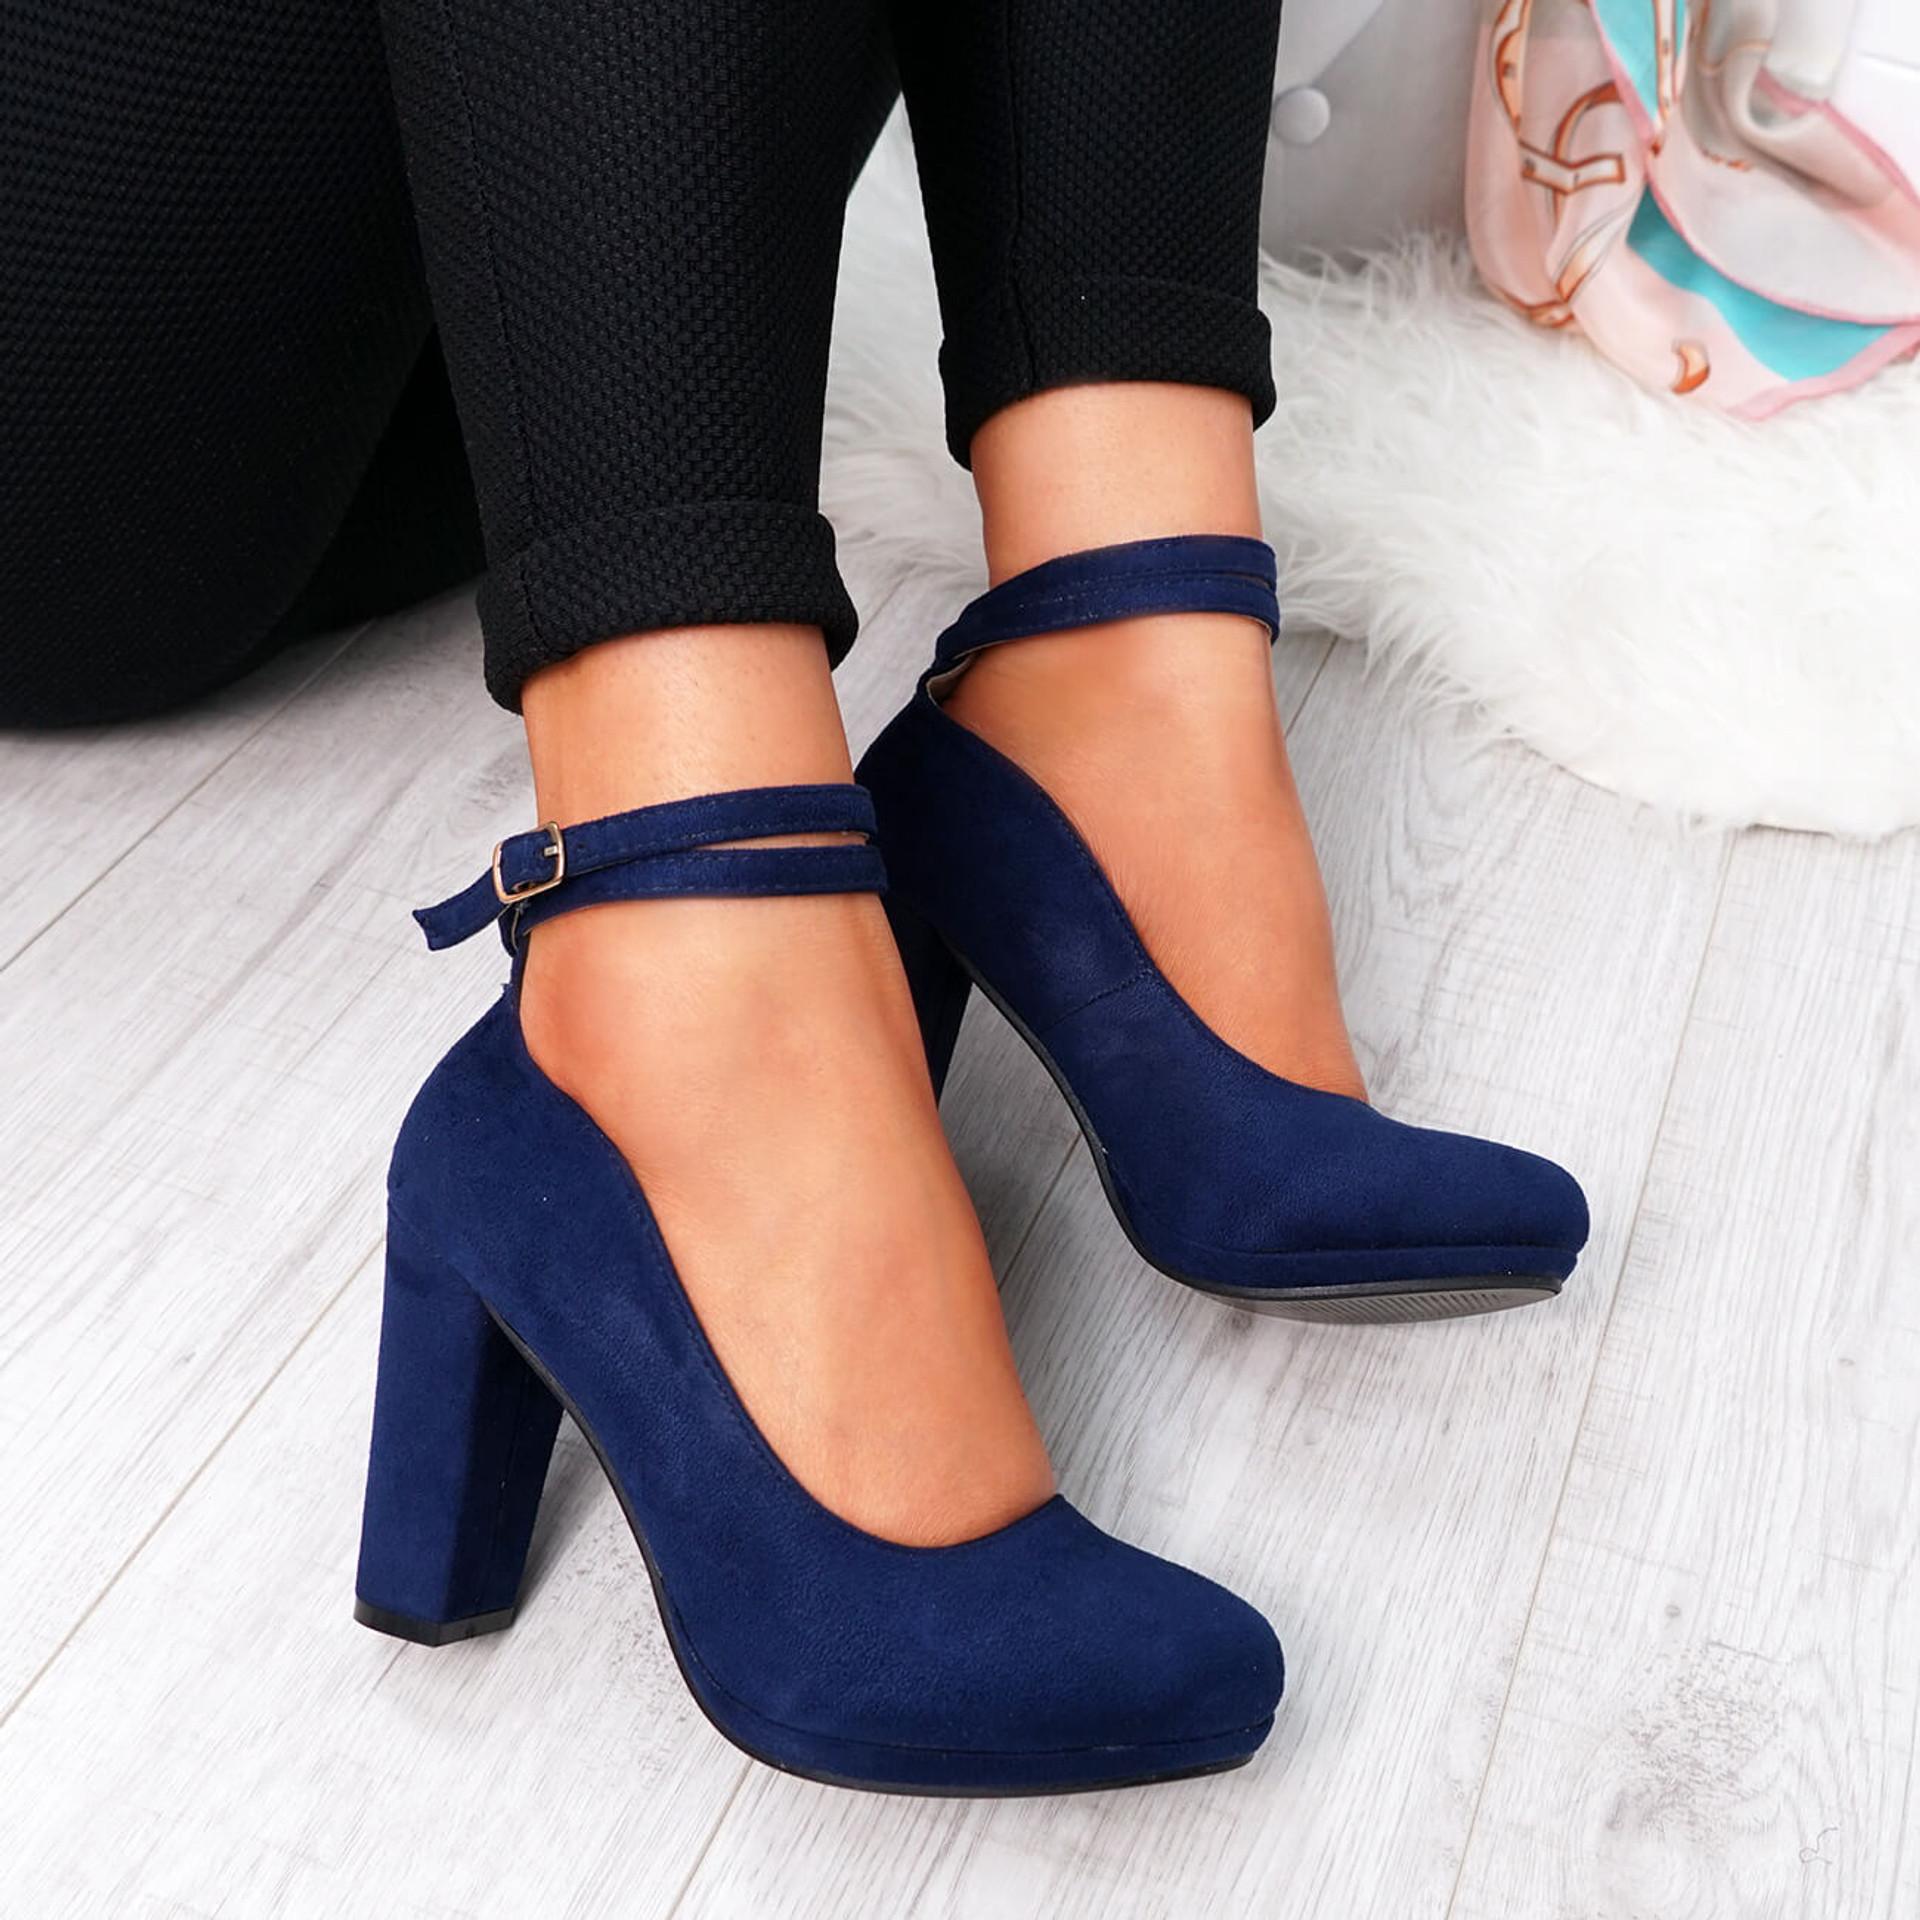 Eby Dark Blue Ankle Strap Pumps